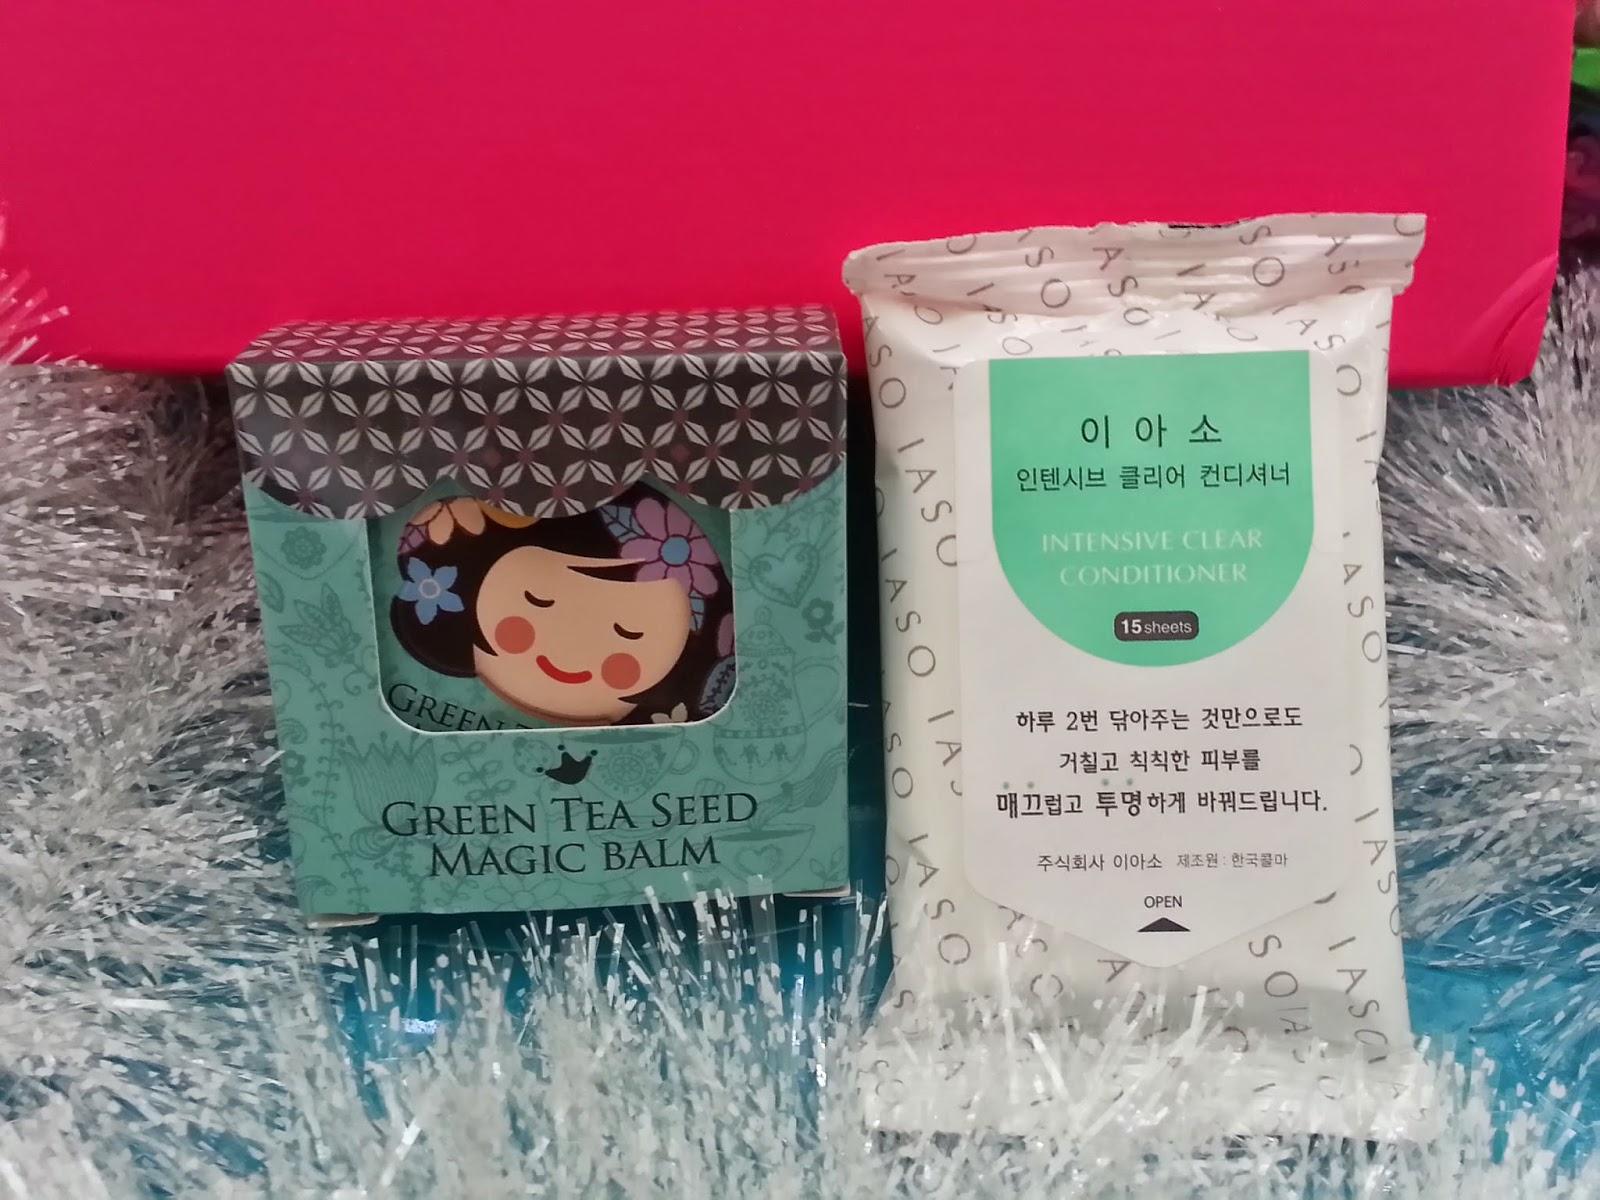 Shara Shara Green Tea Seed Magic Balm and IASO Intensive Clear Conditioner